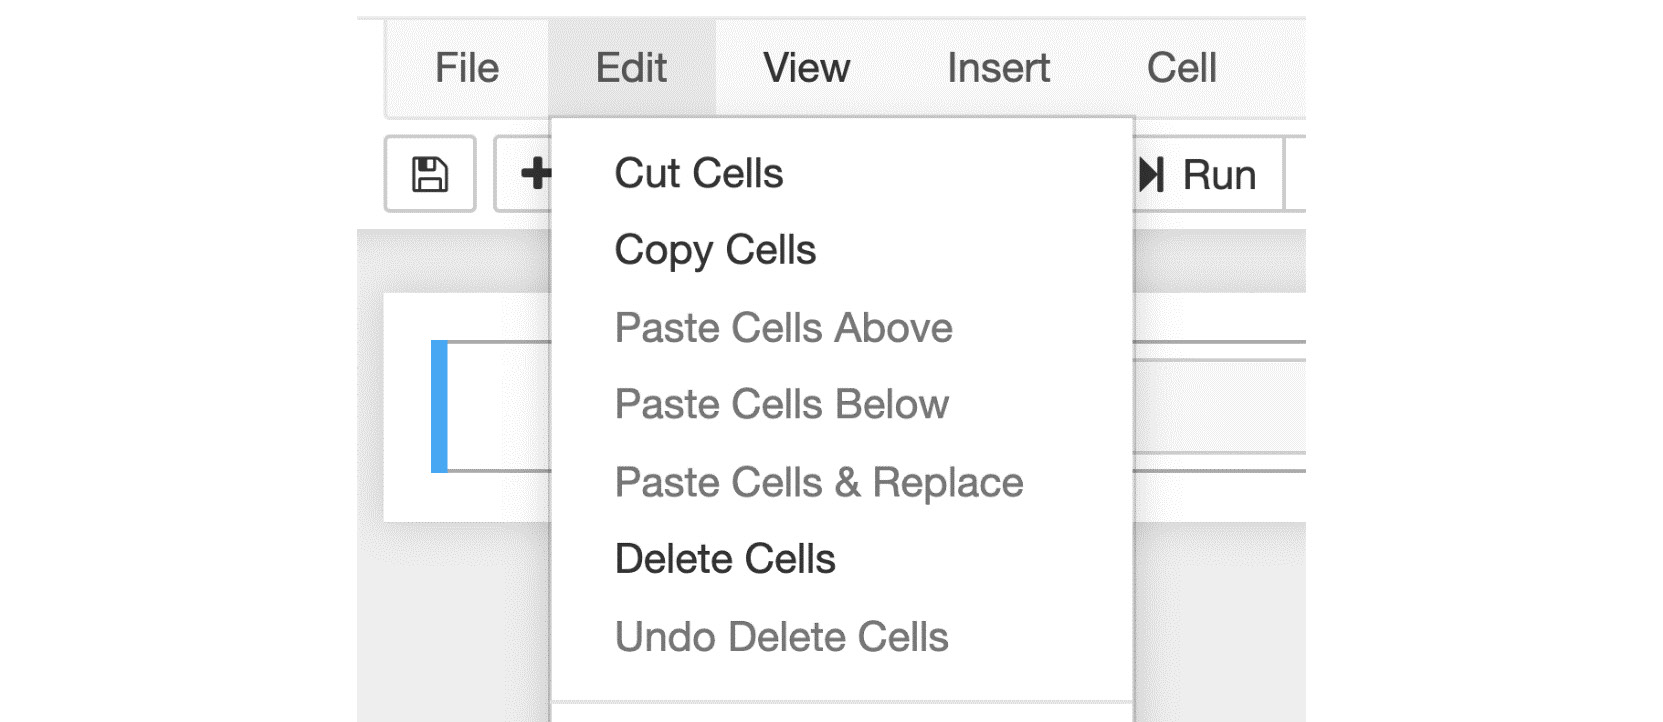 Figure 1.9: Menu options to cut, copy, and paste cells